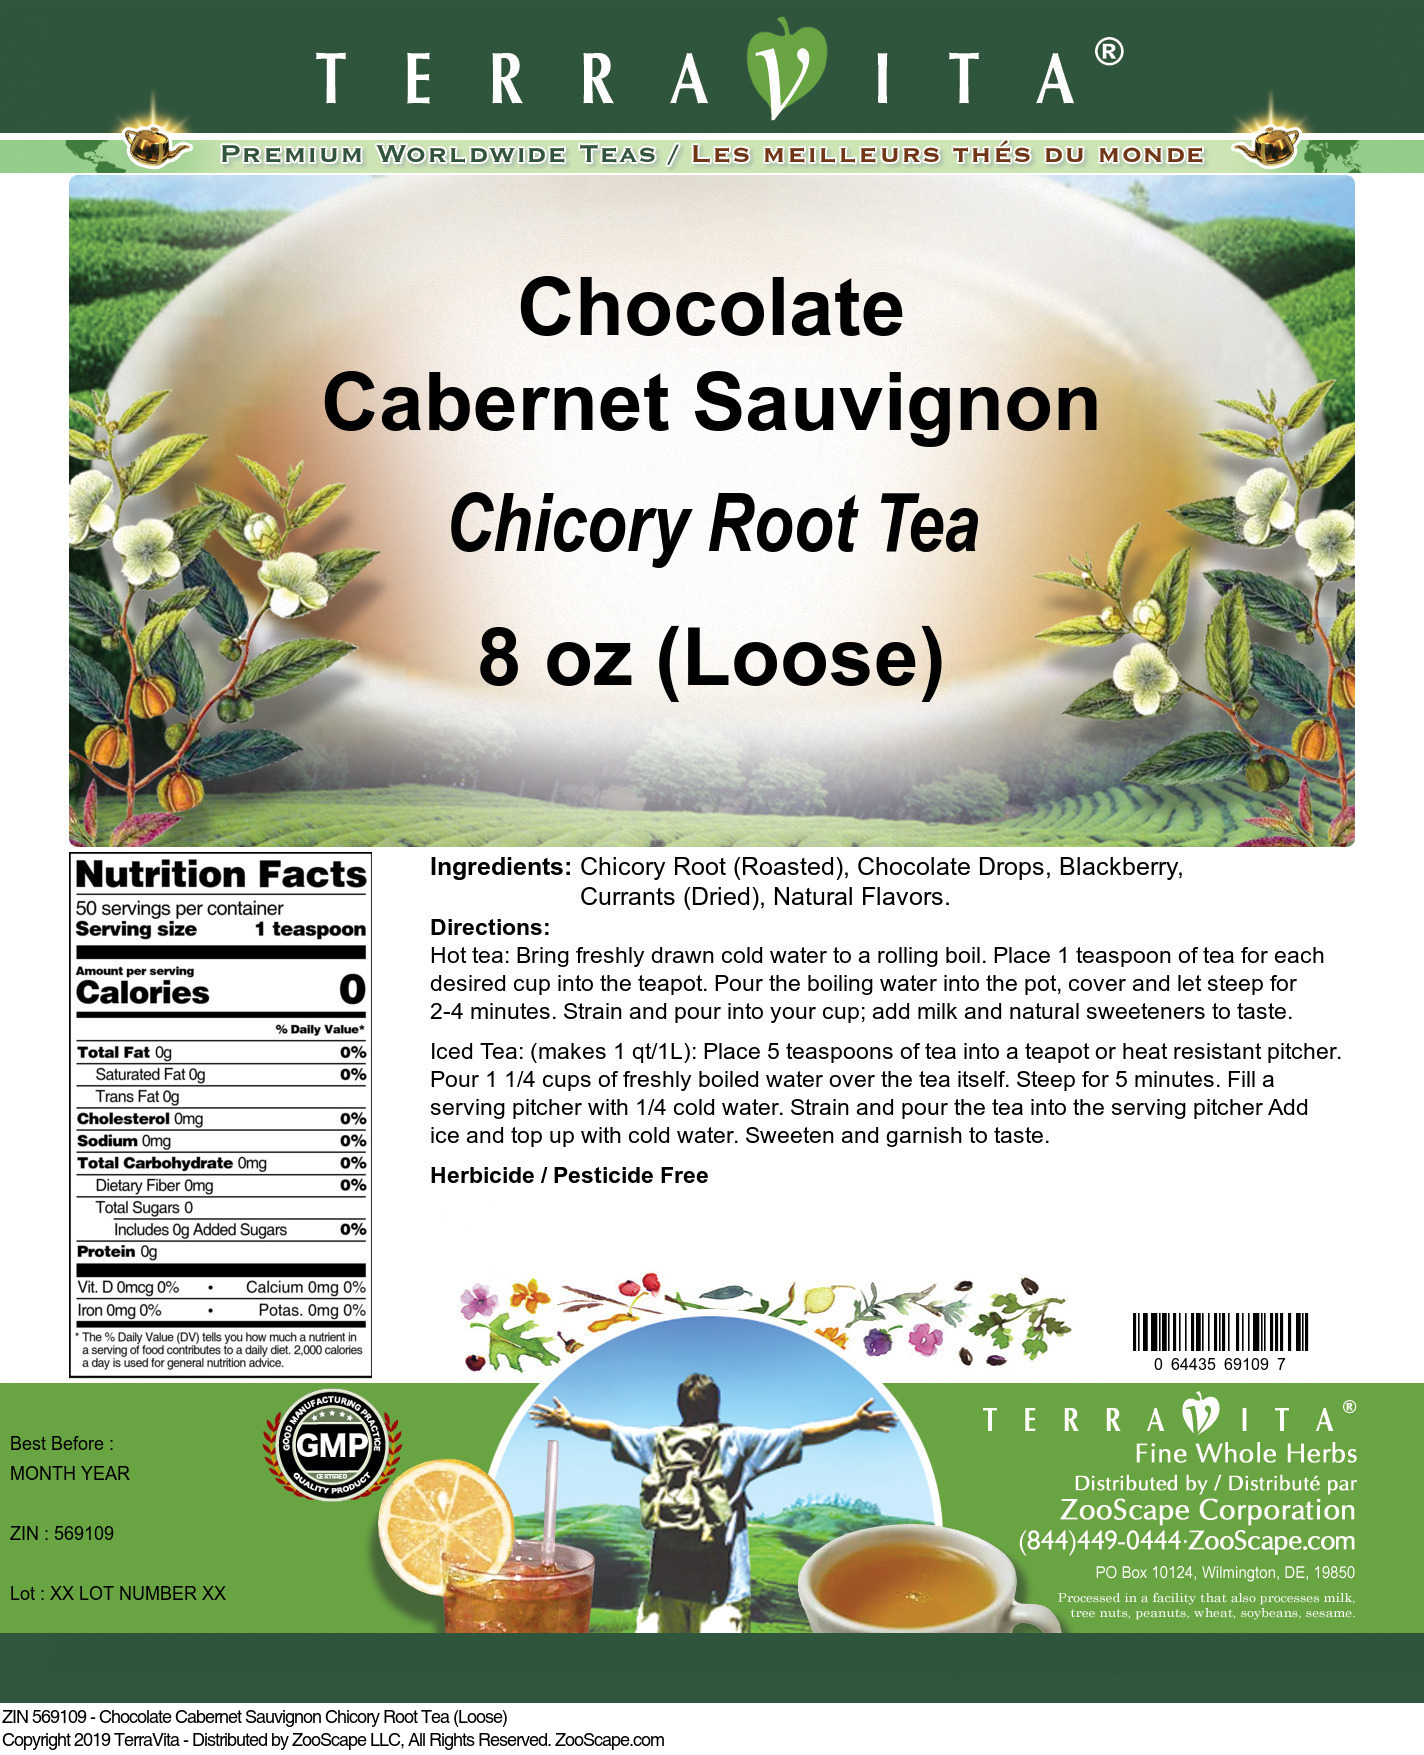 Chocolate Cabernet Sauvignon Chicory Root Tea (Loose)